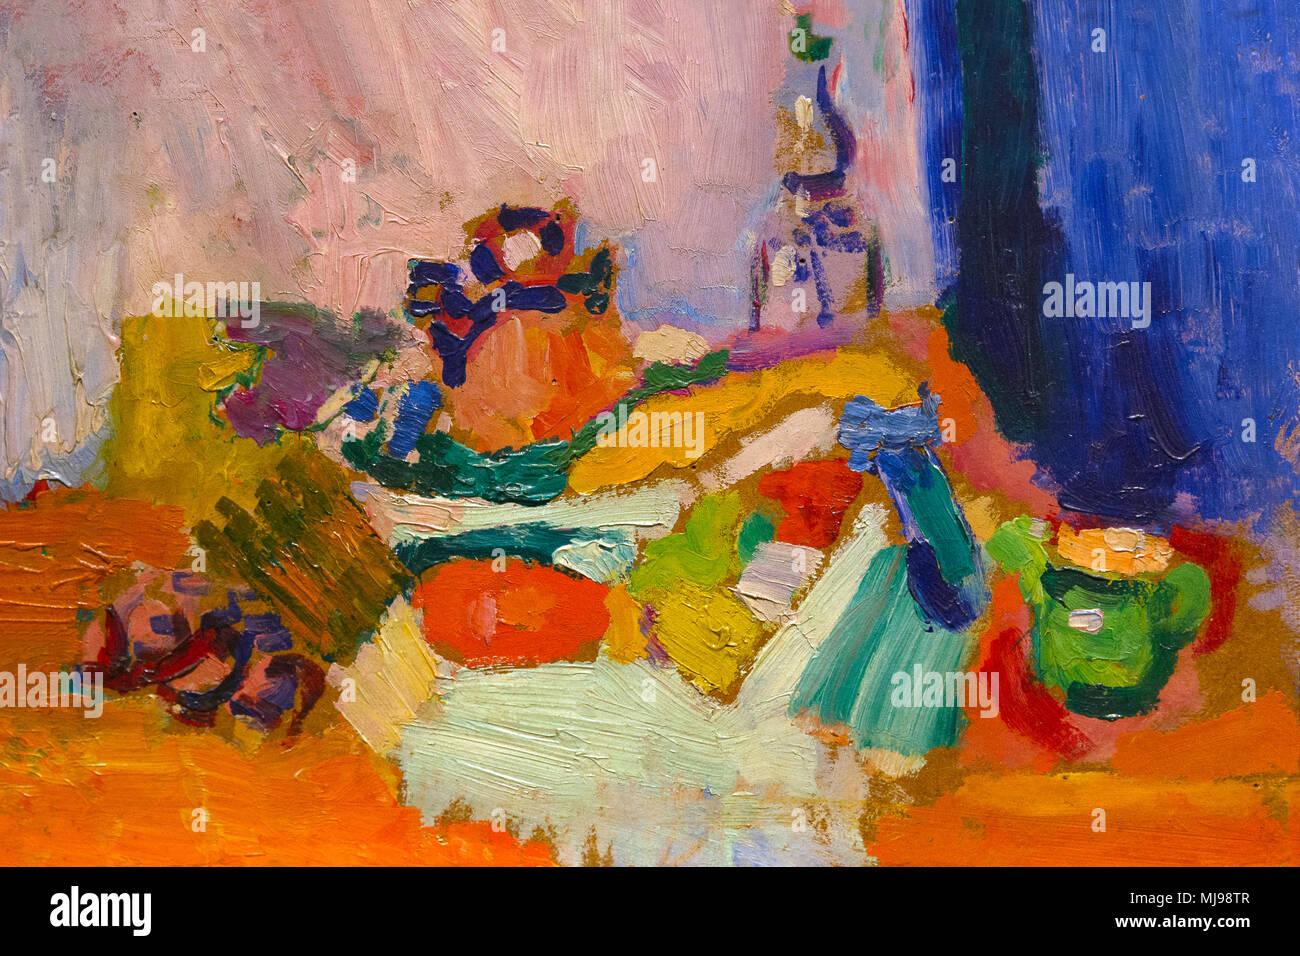 Still Life, Henri Matisse, vers 1905, National Gallery of Art, Washington DC, USA, Amérique du Nord Photo Stock